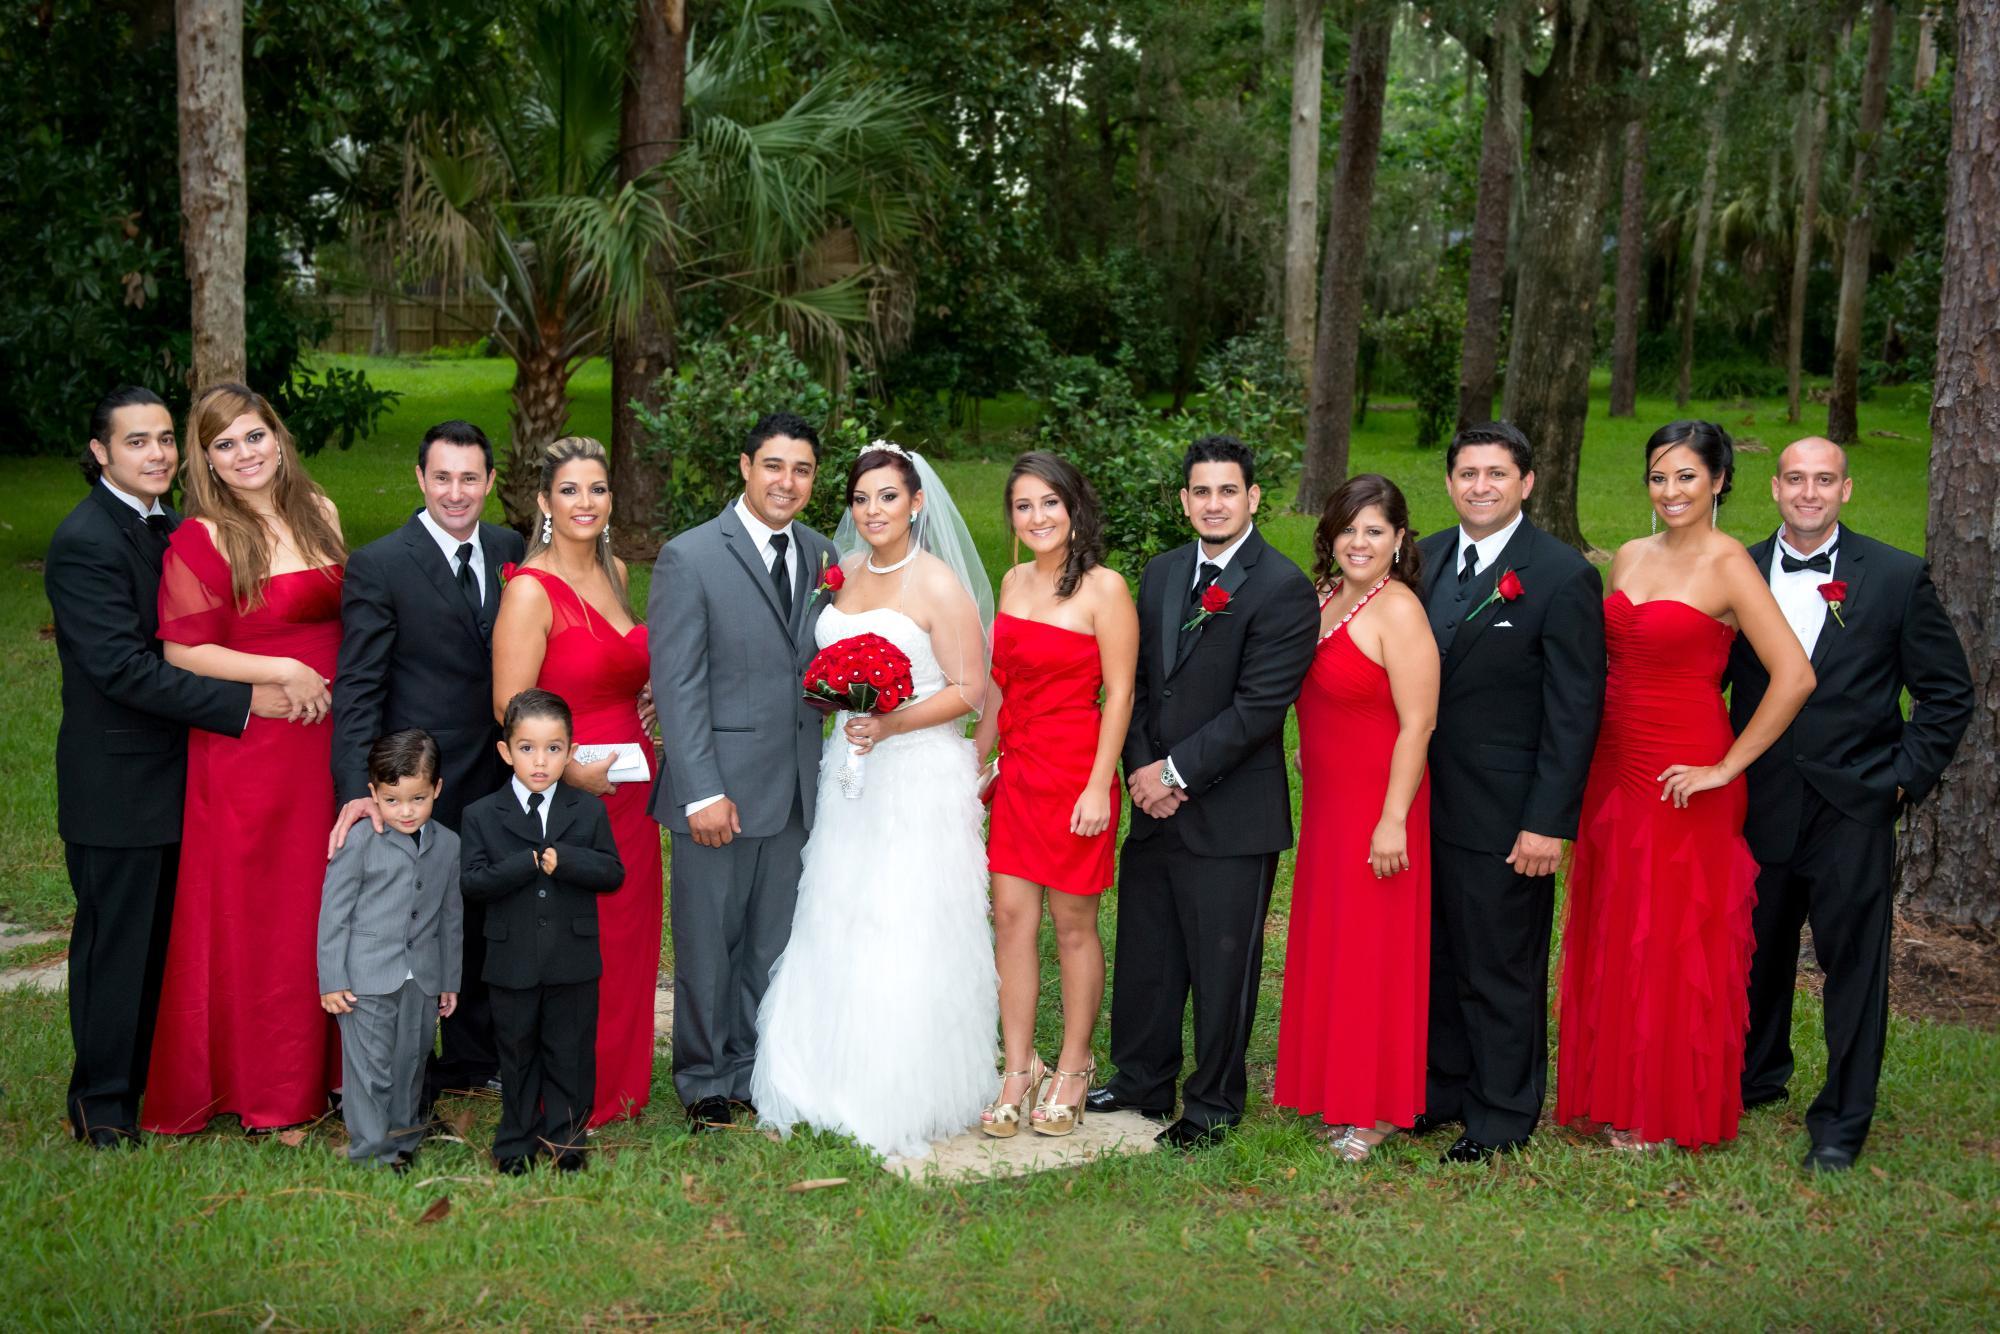 Casamentos-121.jpg